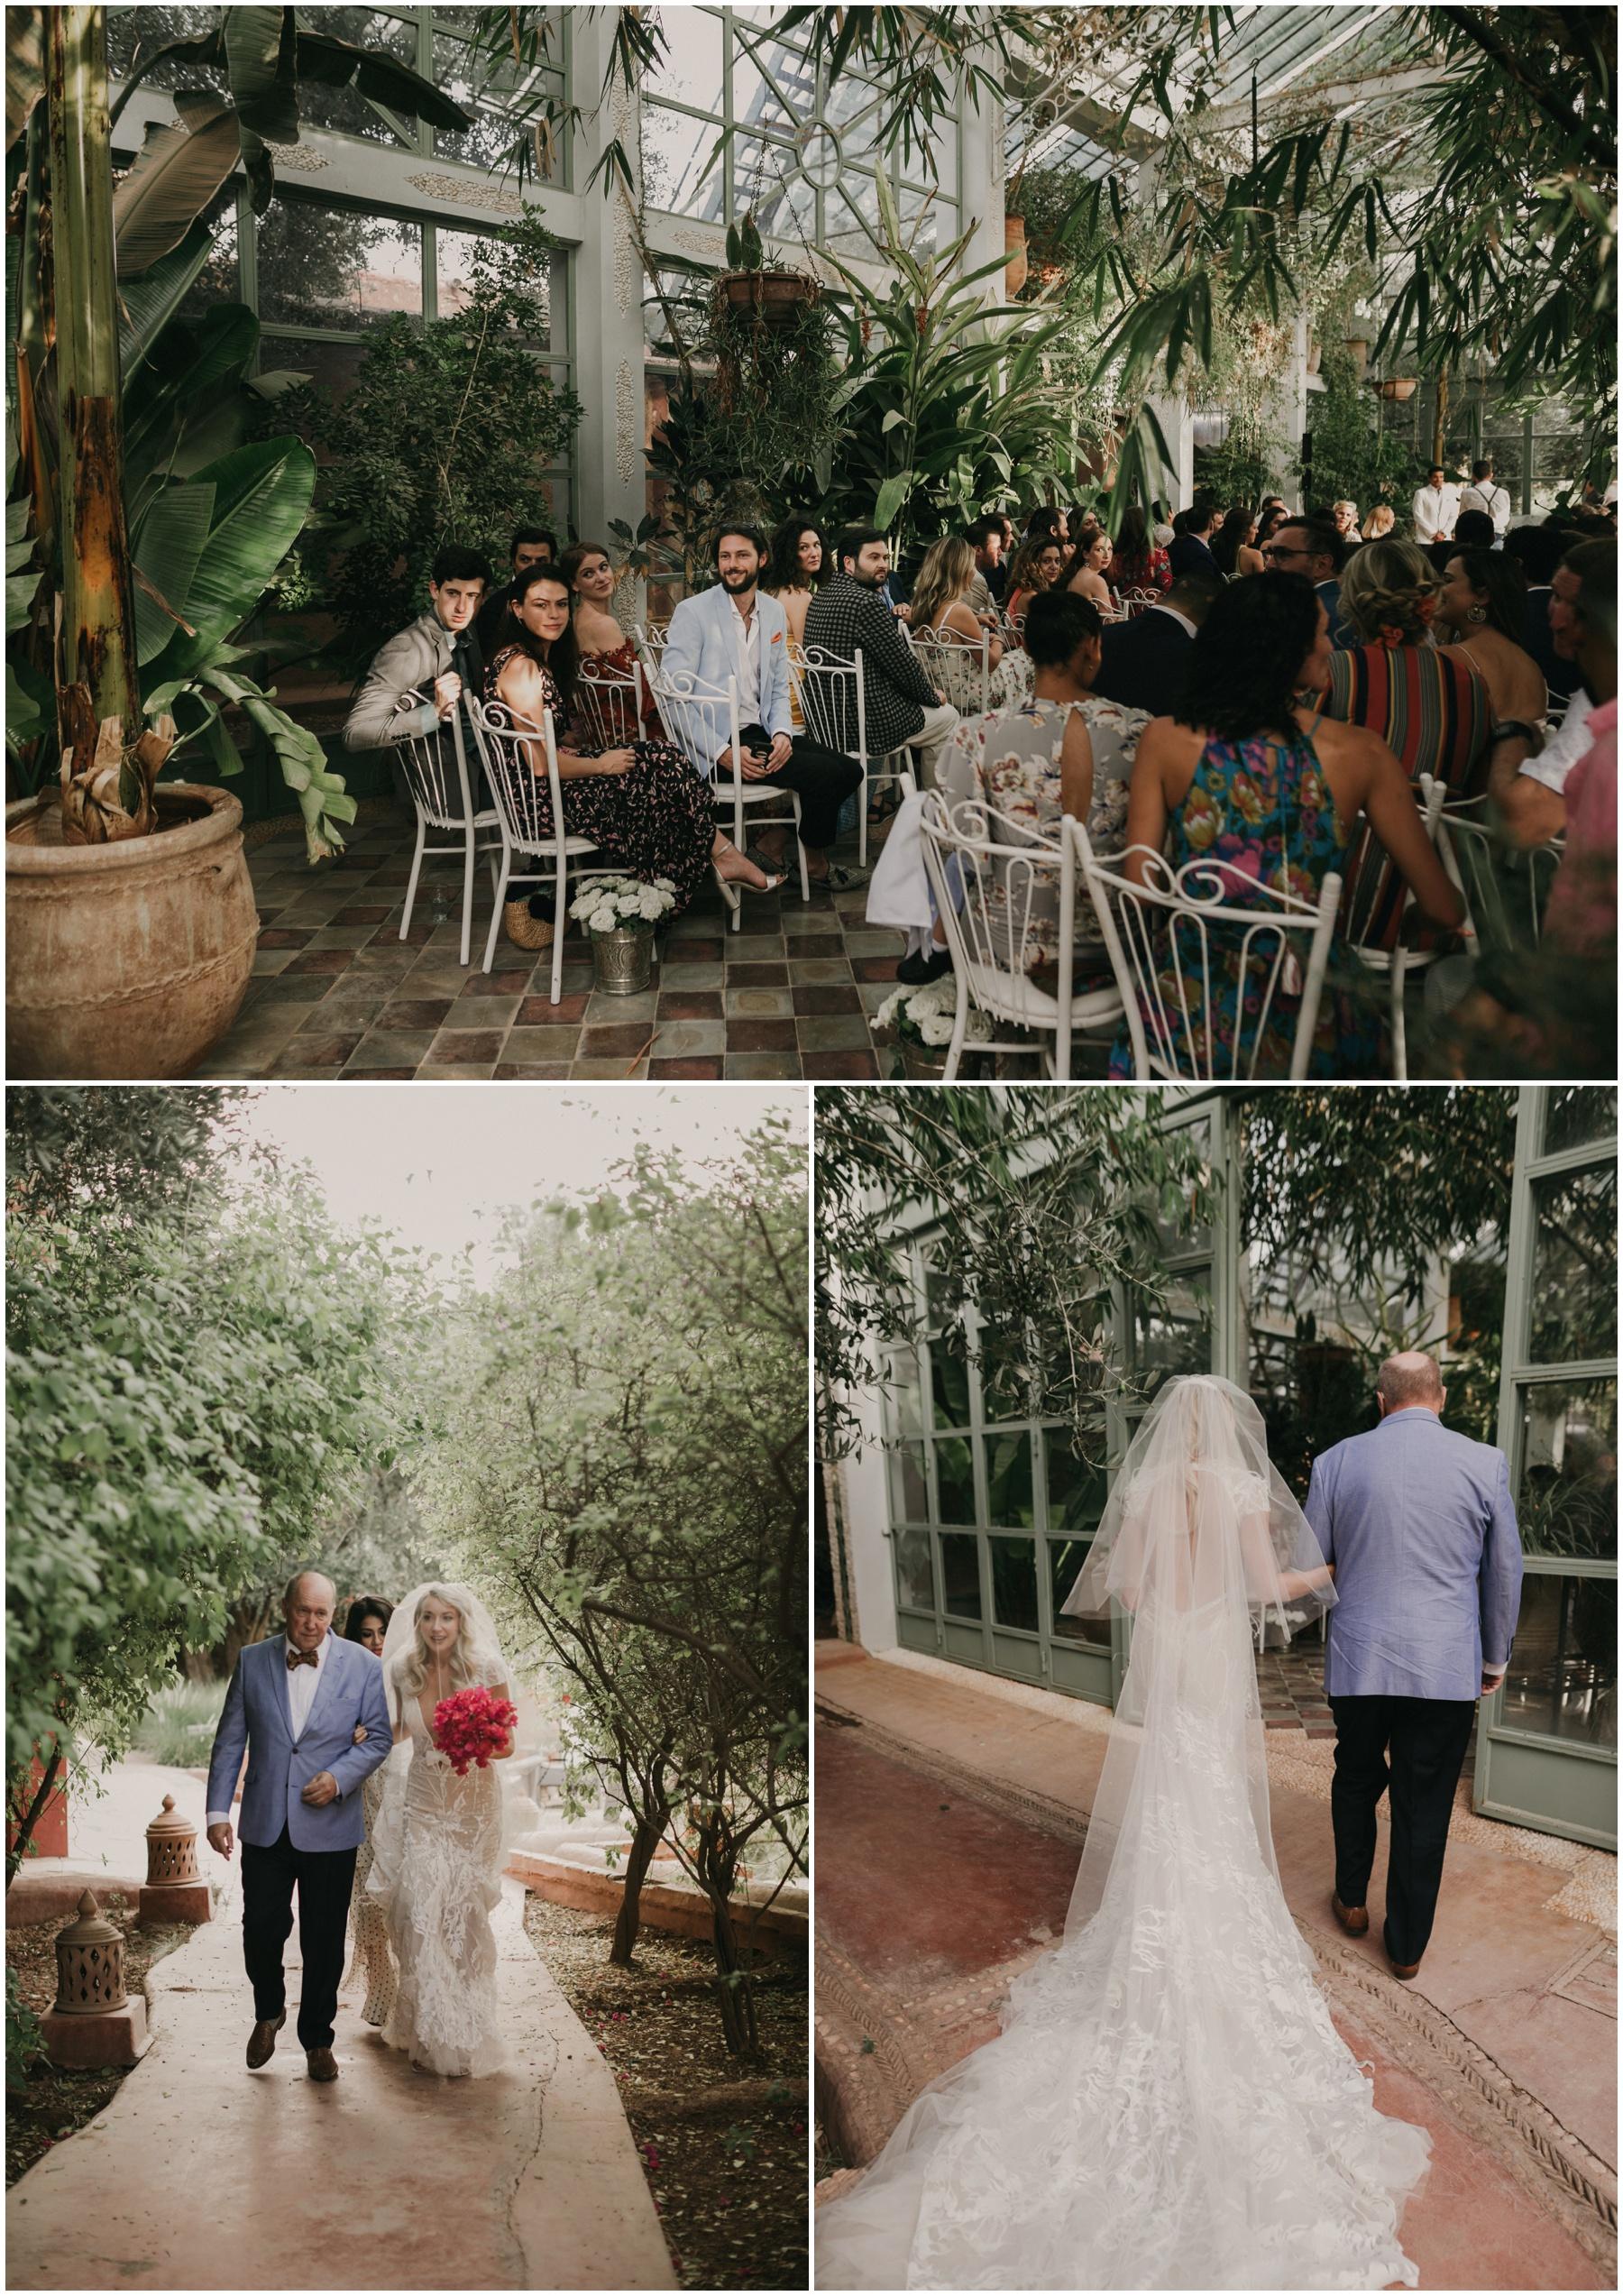 Marrakech Wedding Beldi Coutry Club 030.JPG